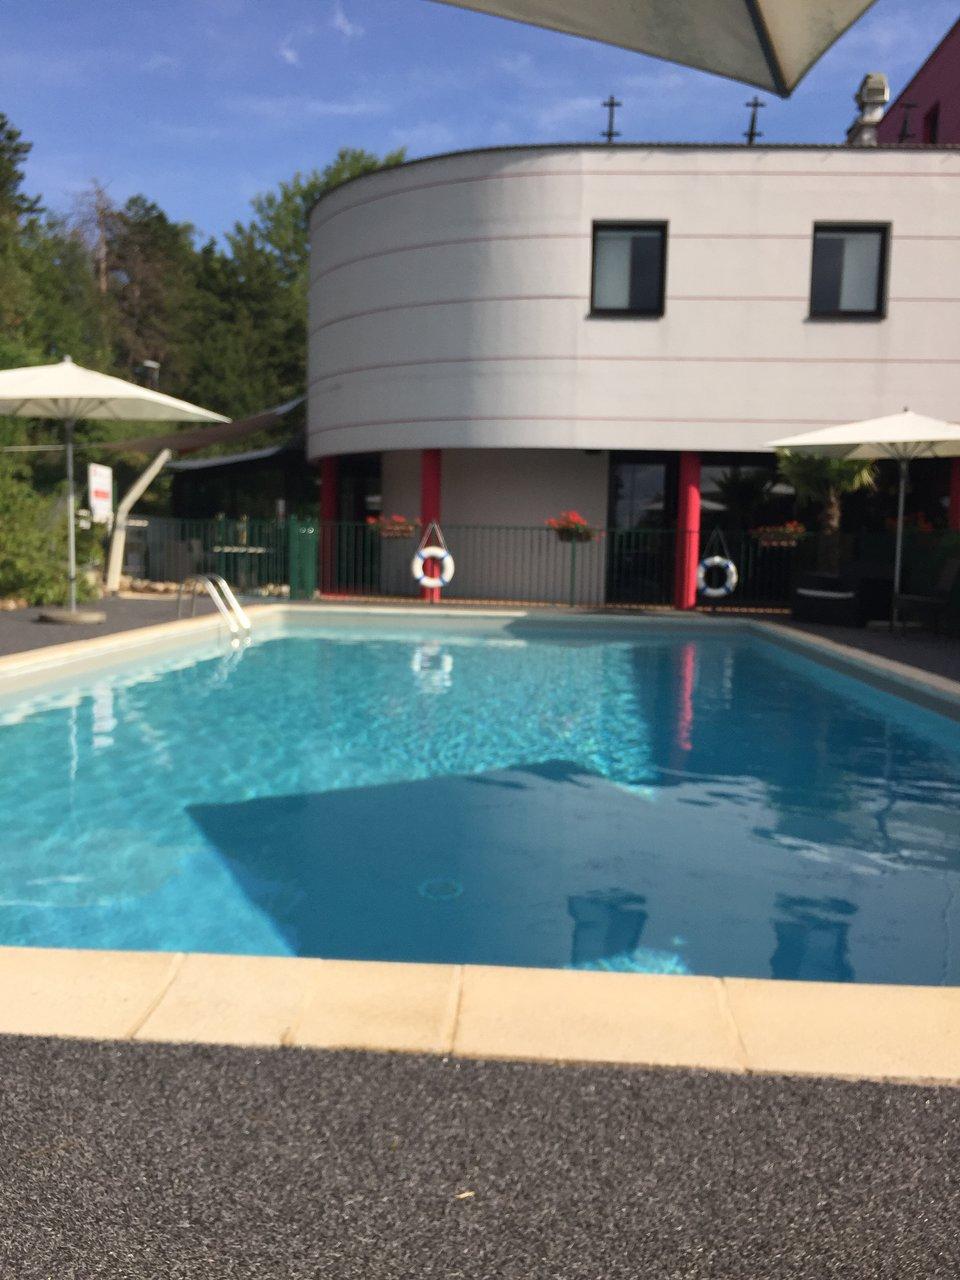 Ibis Chalon Sur Saone Europe Hotel (Chalon-Sur-Saône ... dedans Piscine De Chalon Sur Saone